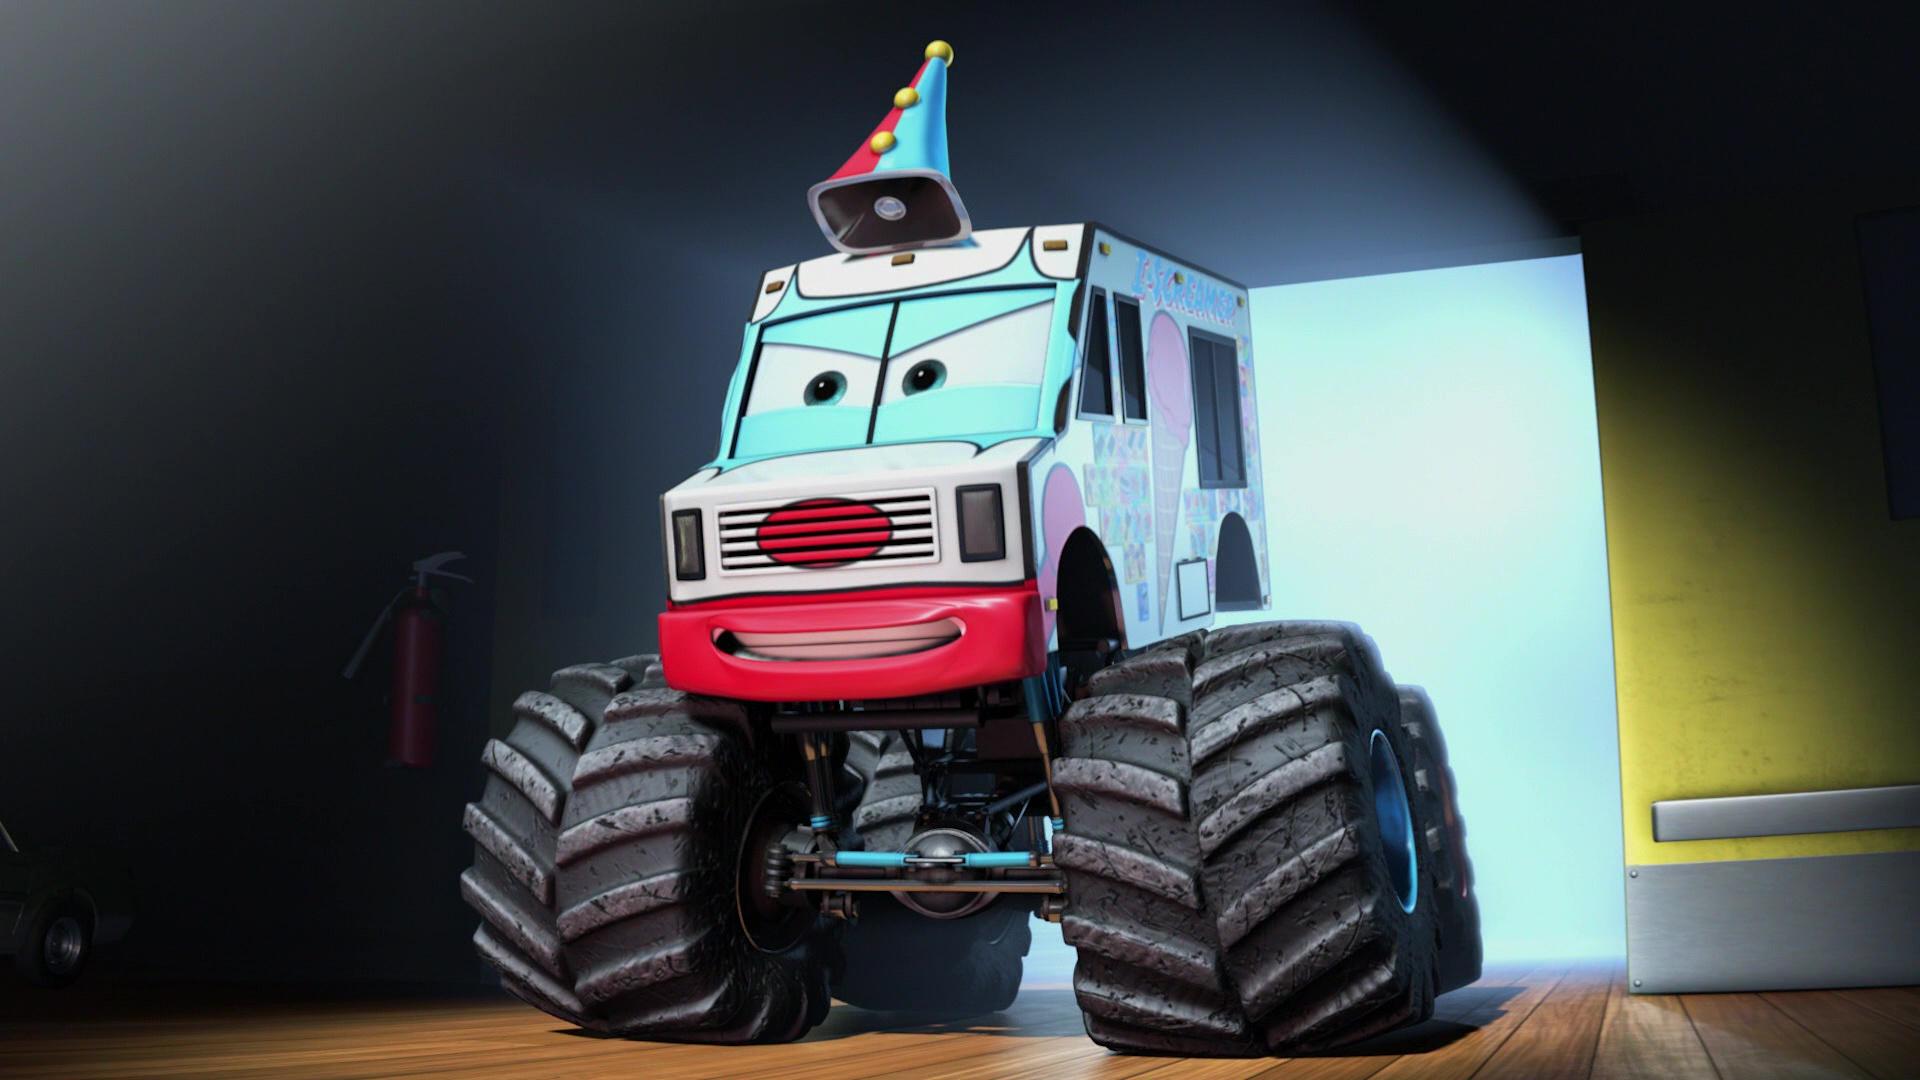 congelateur-cars-toon-martin-poids-lourd-01